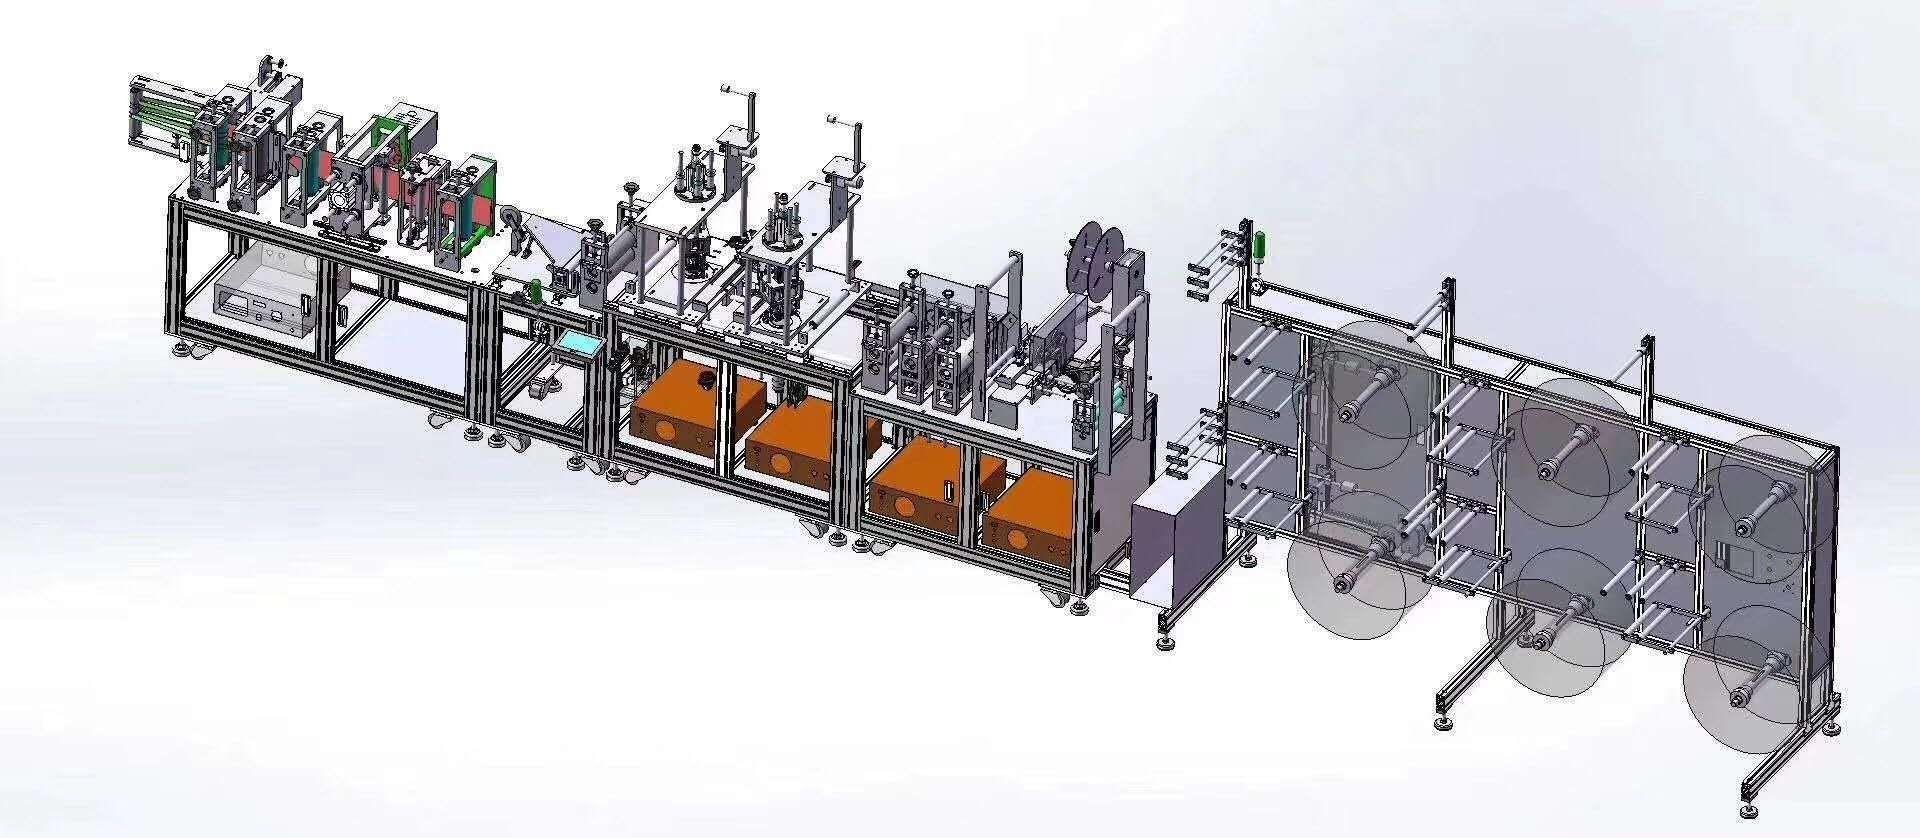 Mask production machine